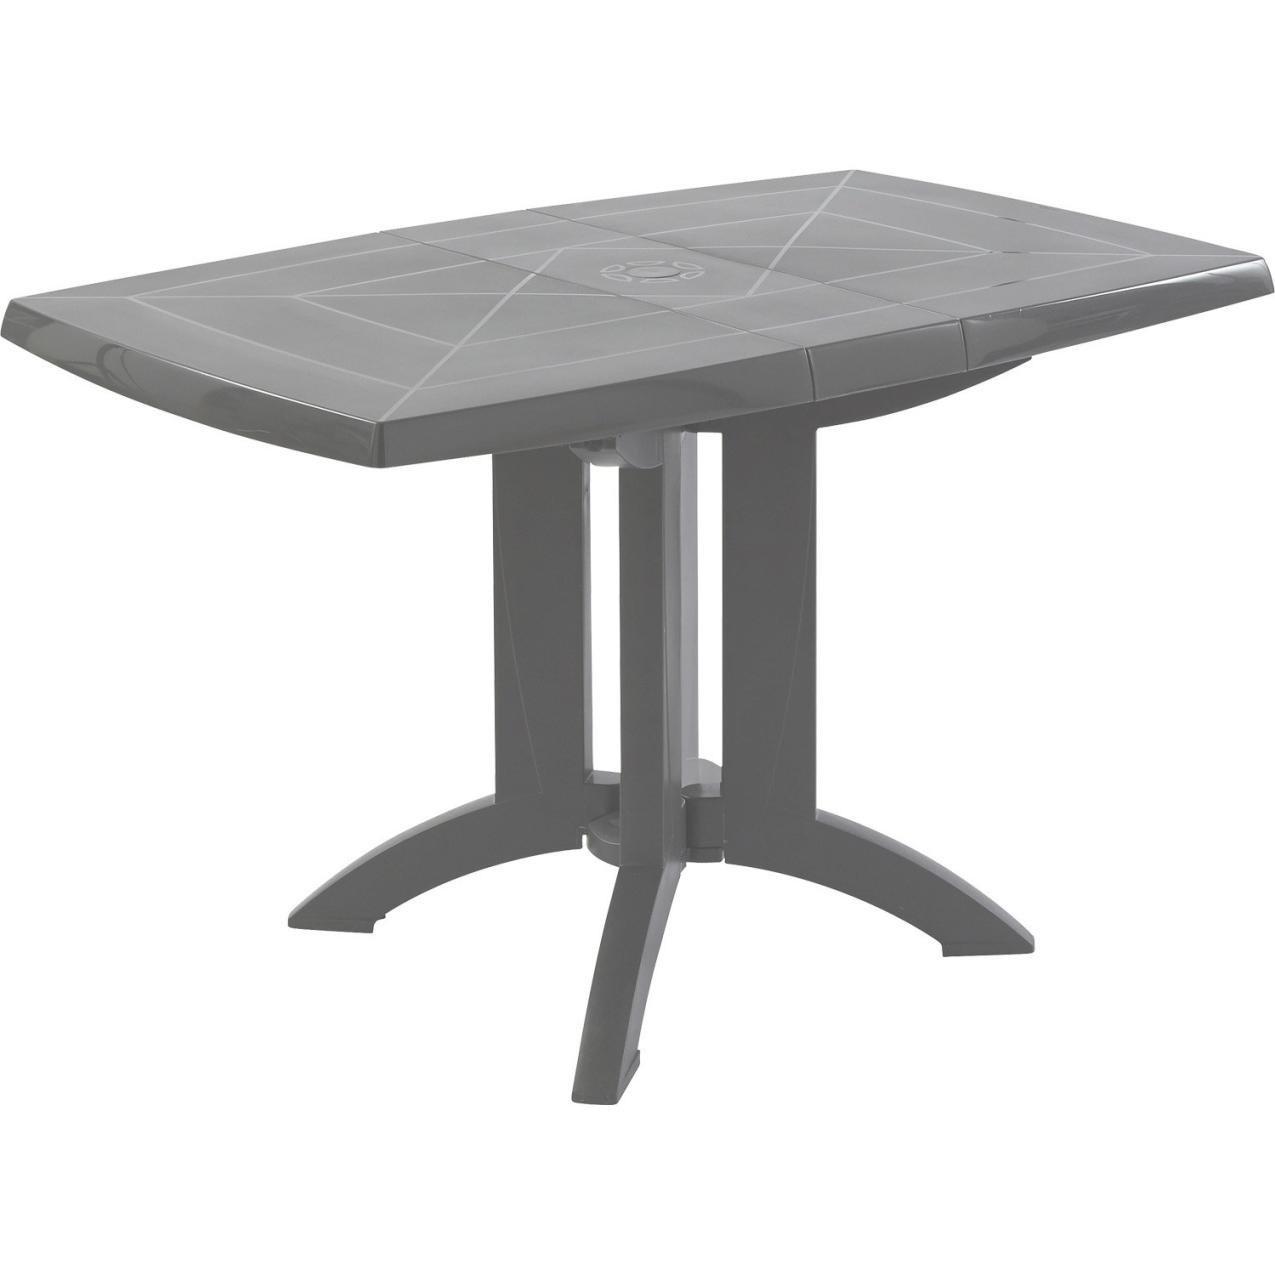 Coffre Jardin Gifi Unique Leroy Merlin Table Pliante ... pour Banc De Jardin Leroy Merlin